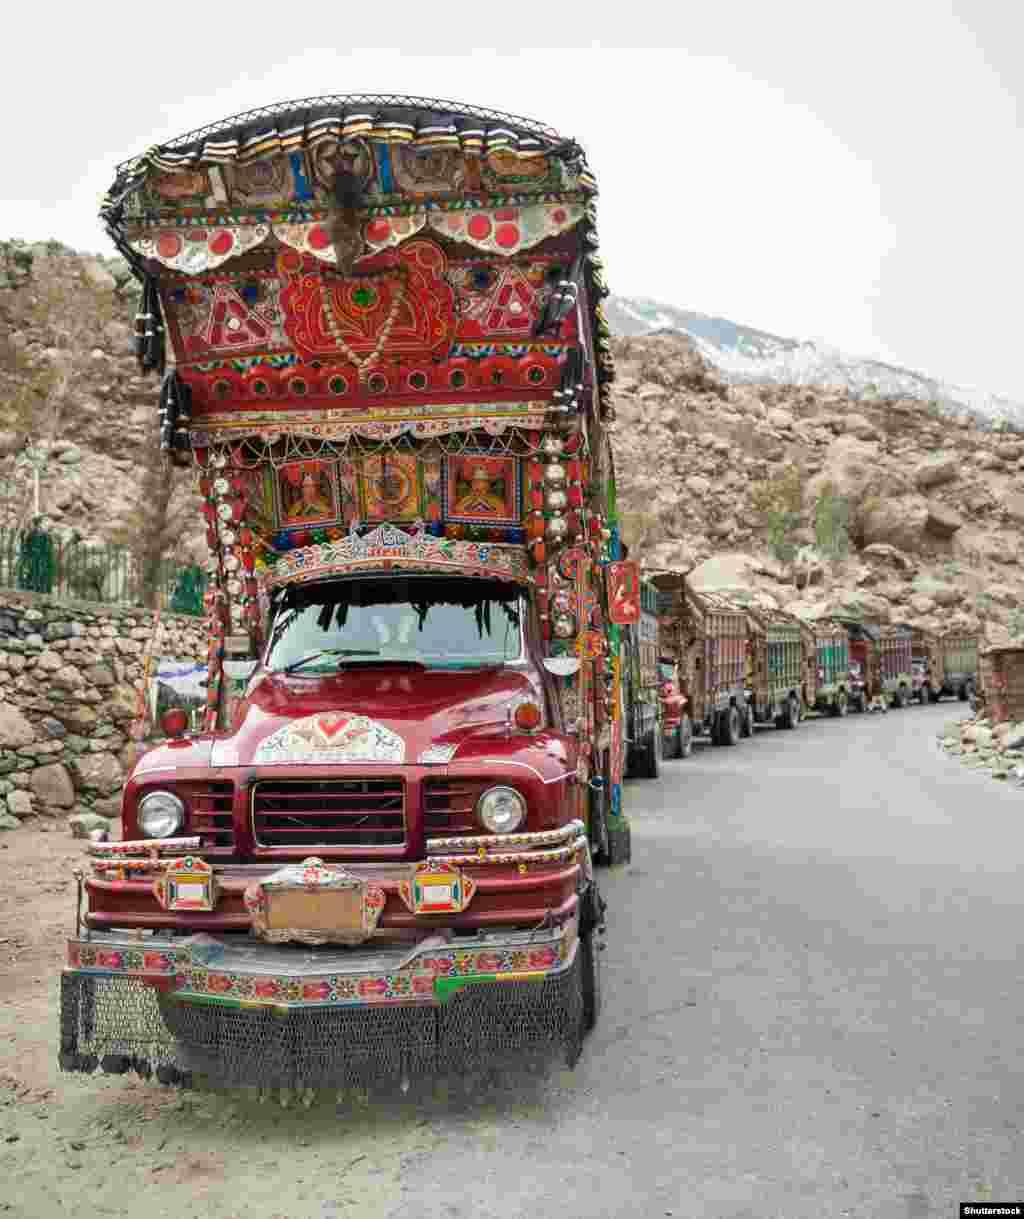 Aerodynamics take a backseat to aesthetics on Pakistan's highways.